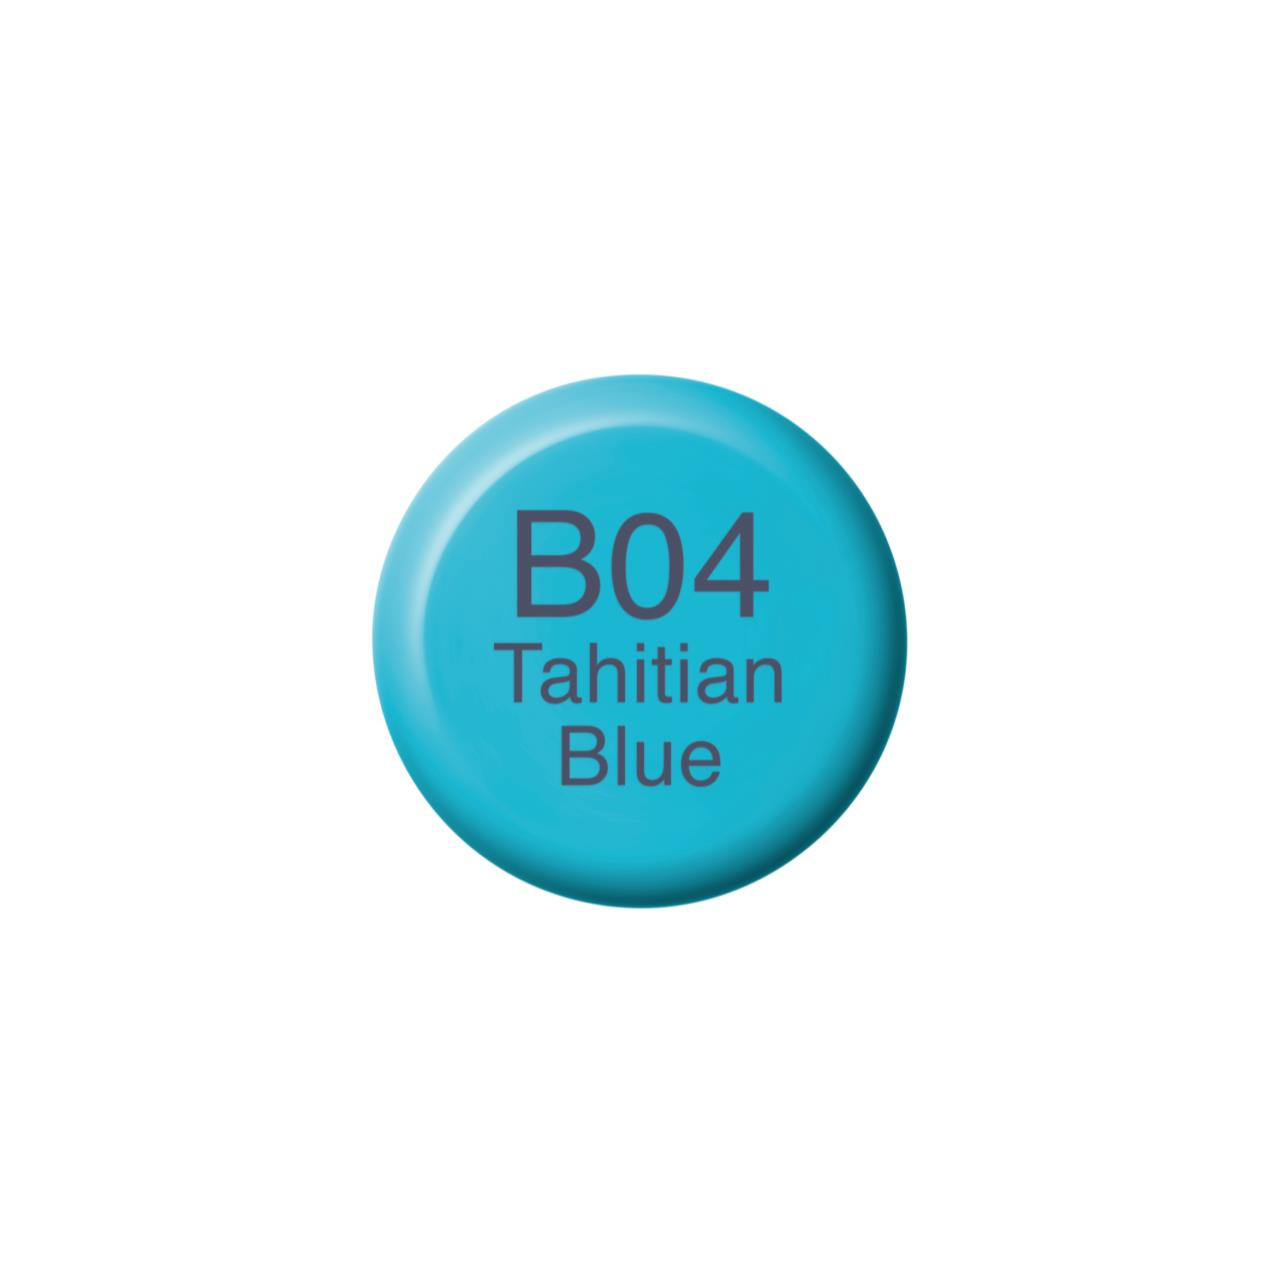 B04 Tahitian Blue, Copic Ink - 4511338055854